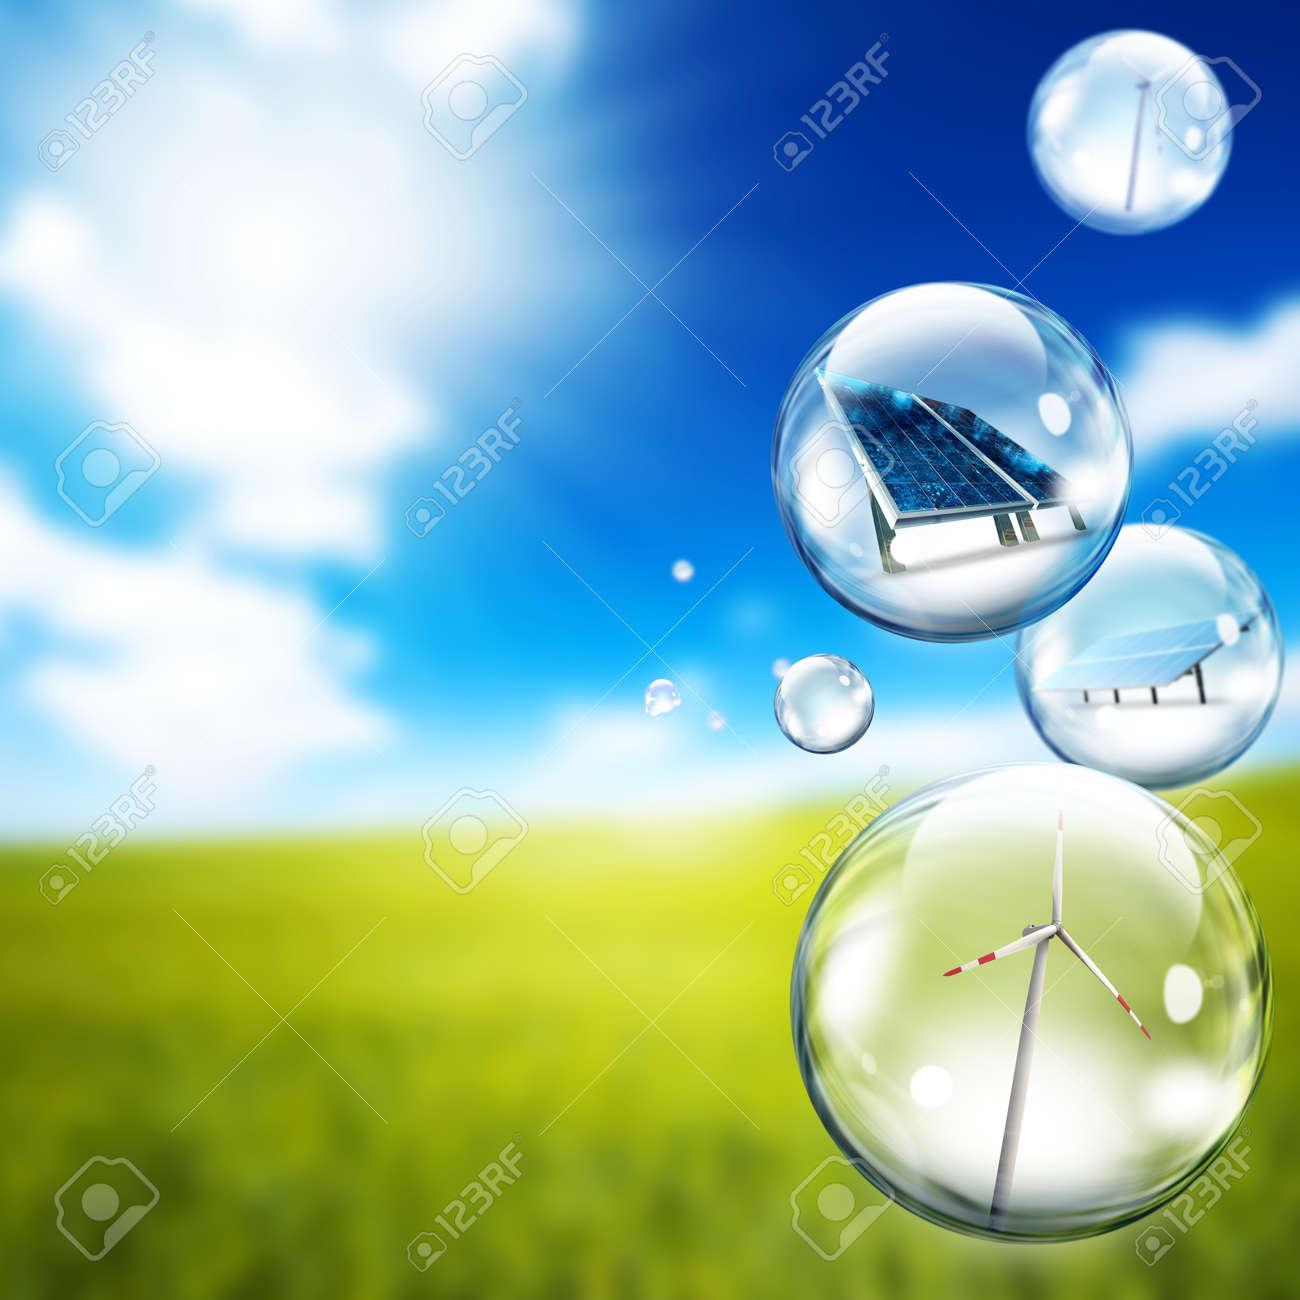 Solar panel and wind turbine inside soap bubbles - 9576478